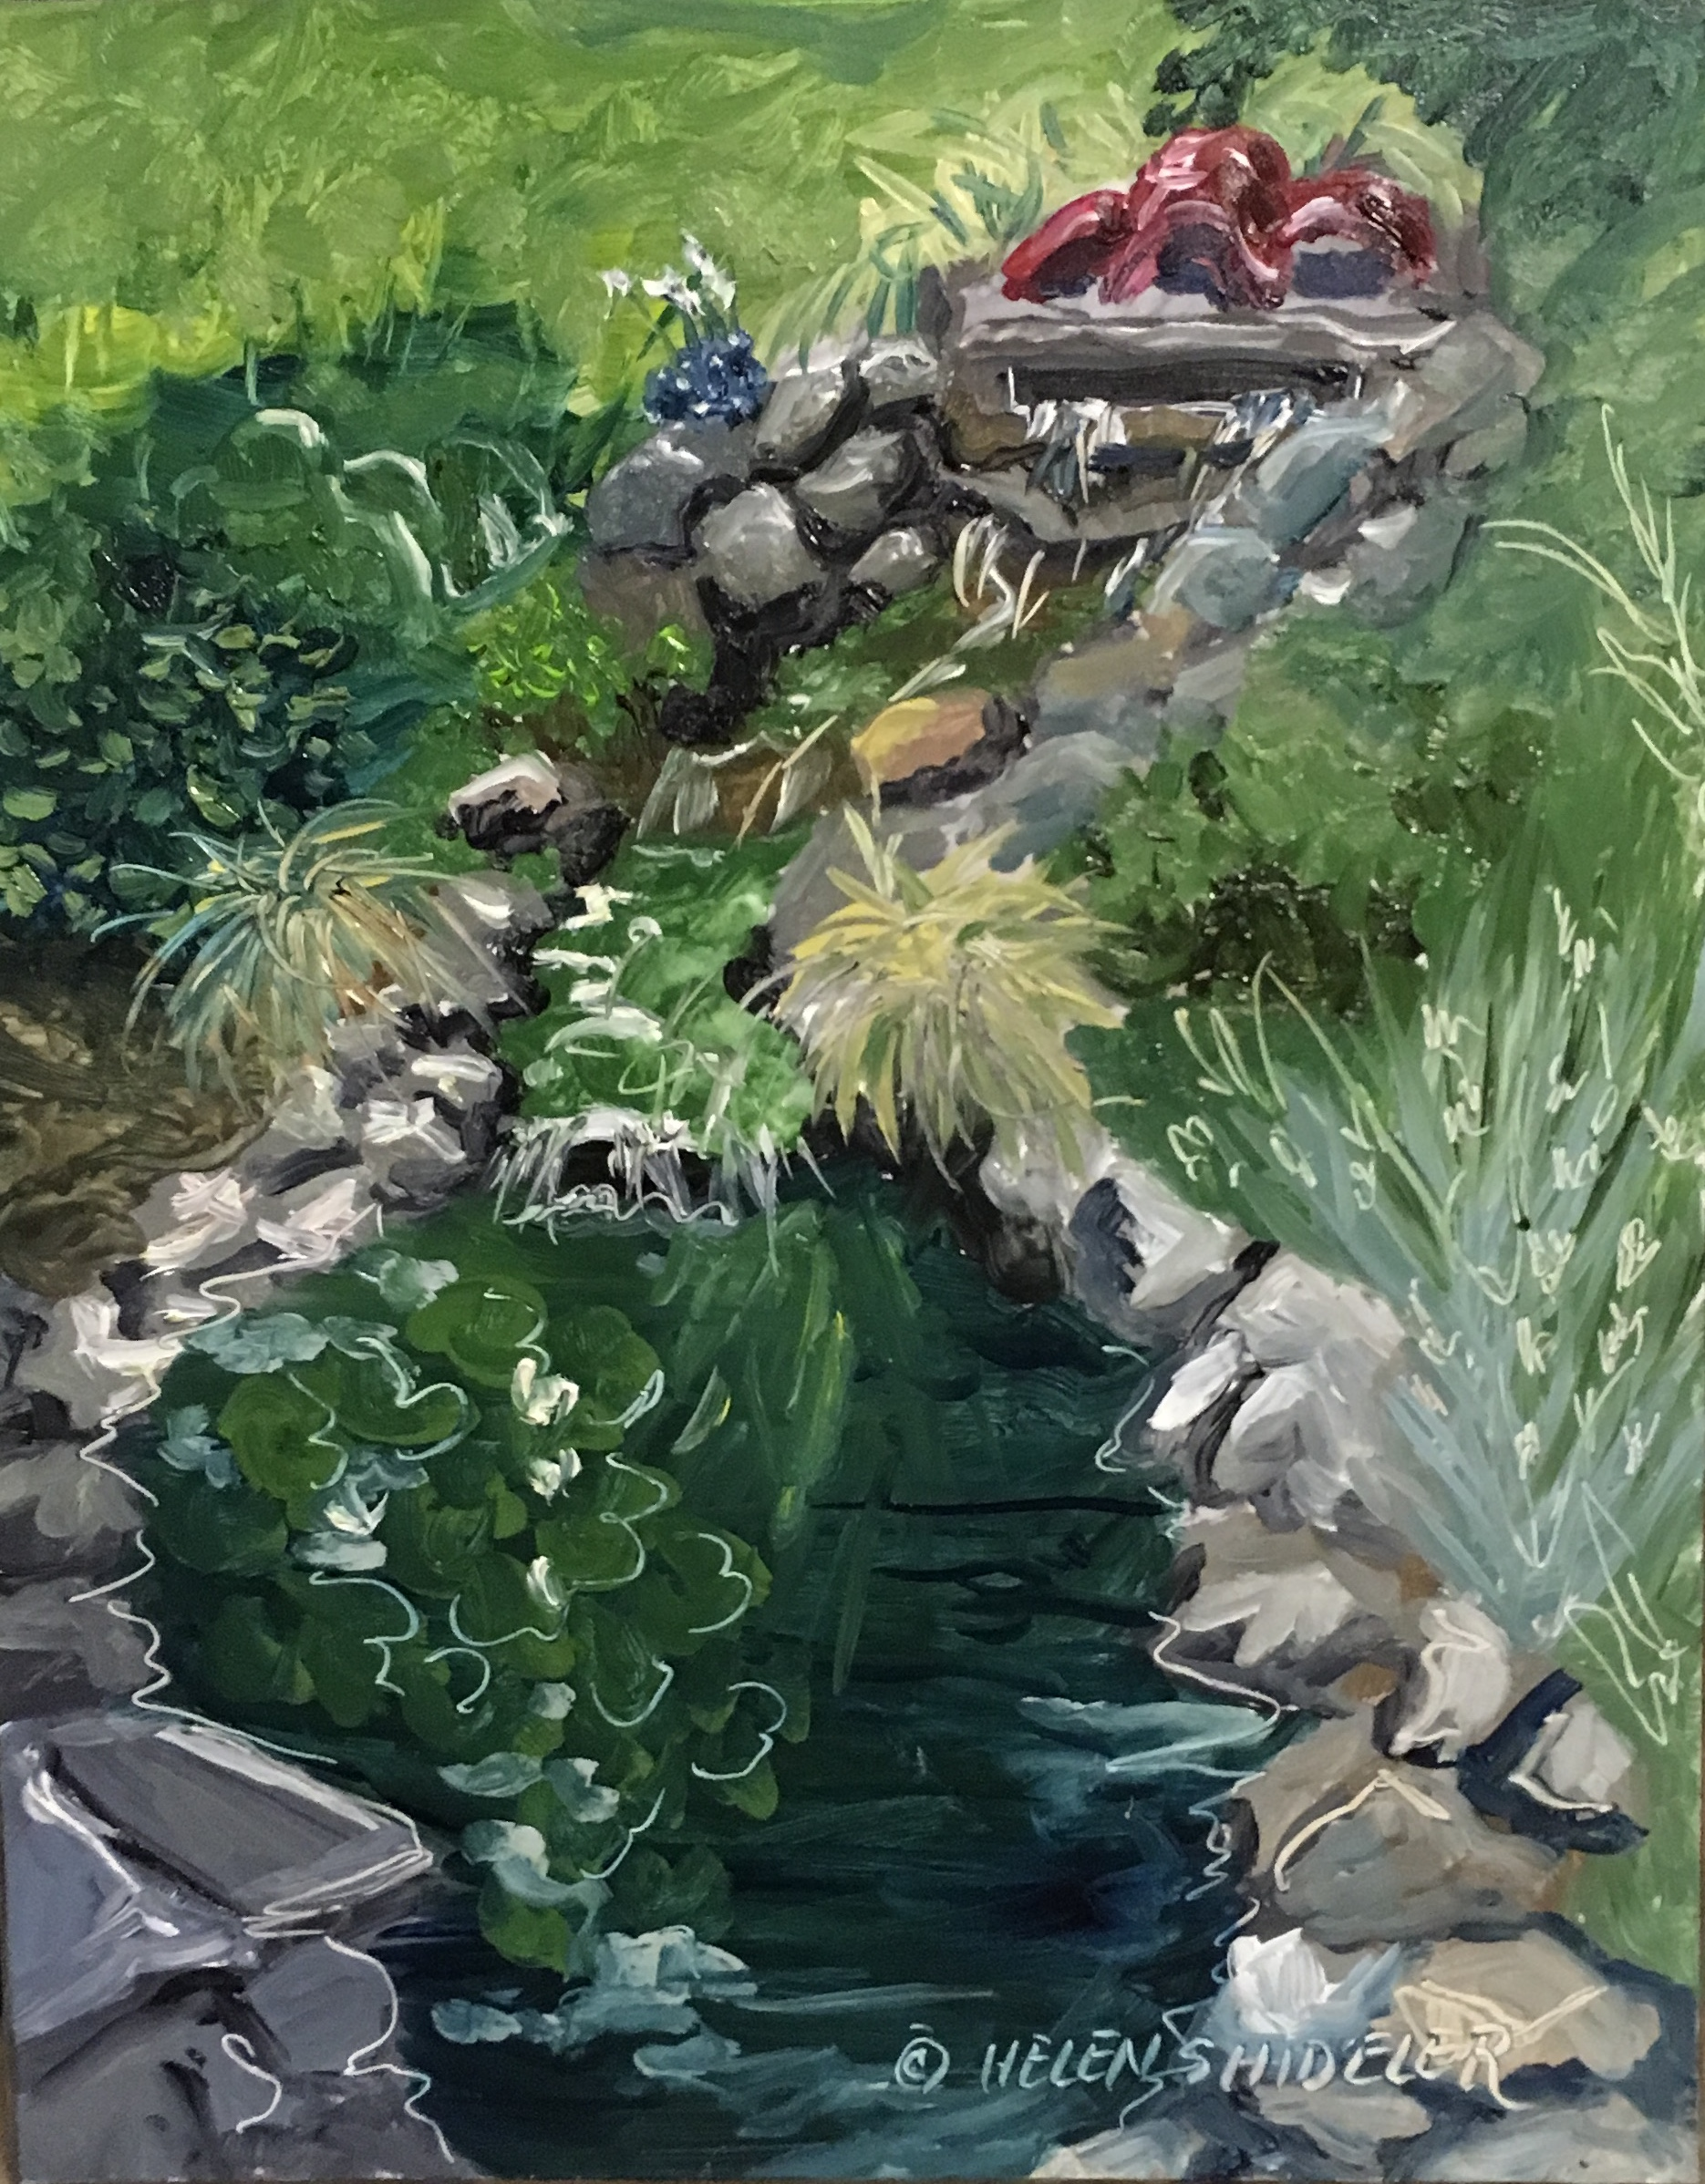 Backyard garden by Shideler